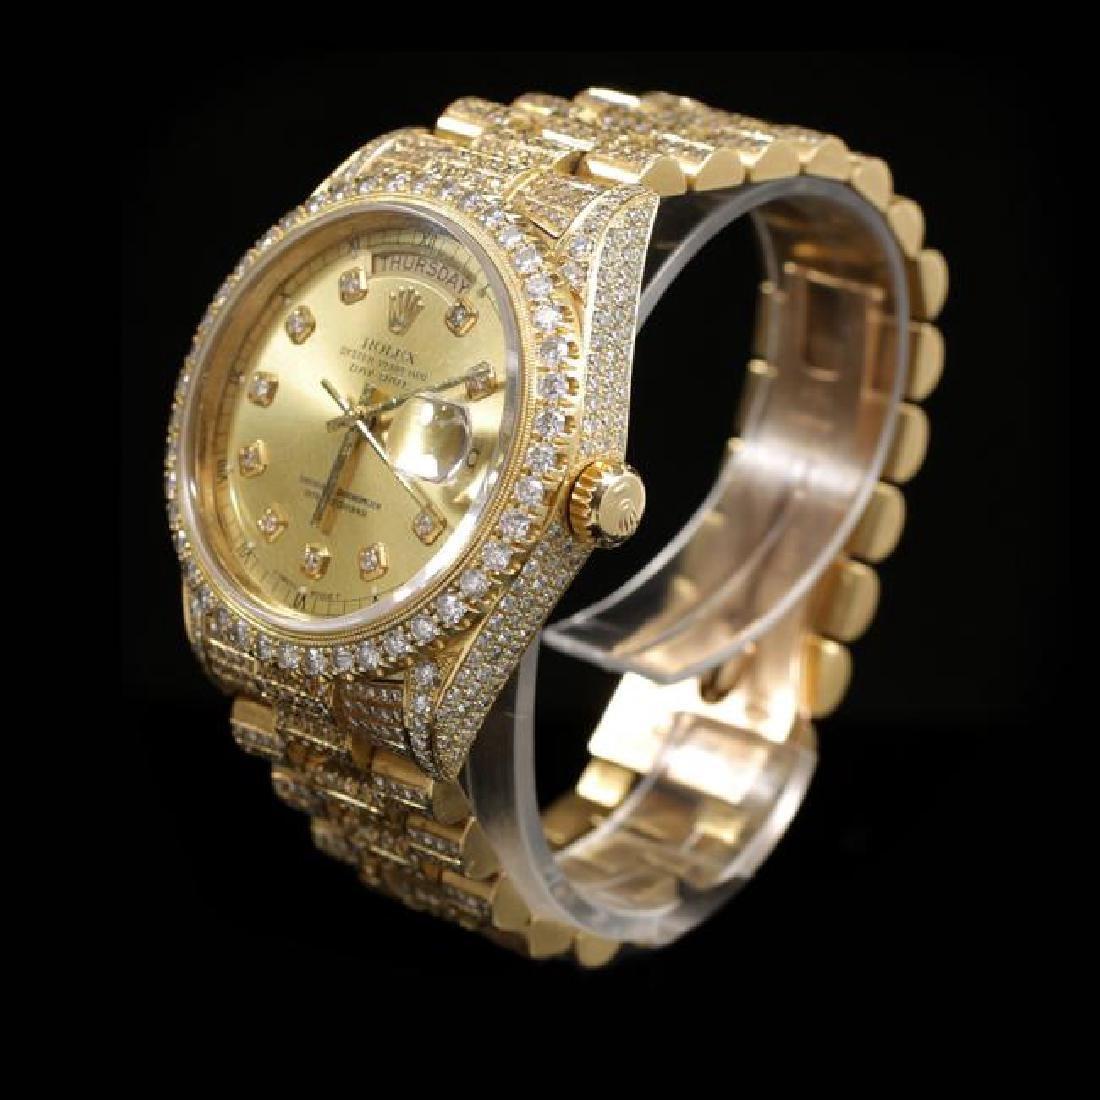 Rolex Day-Date 36mm Yellow Gold Mens Diamond Wristwatch - 2